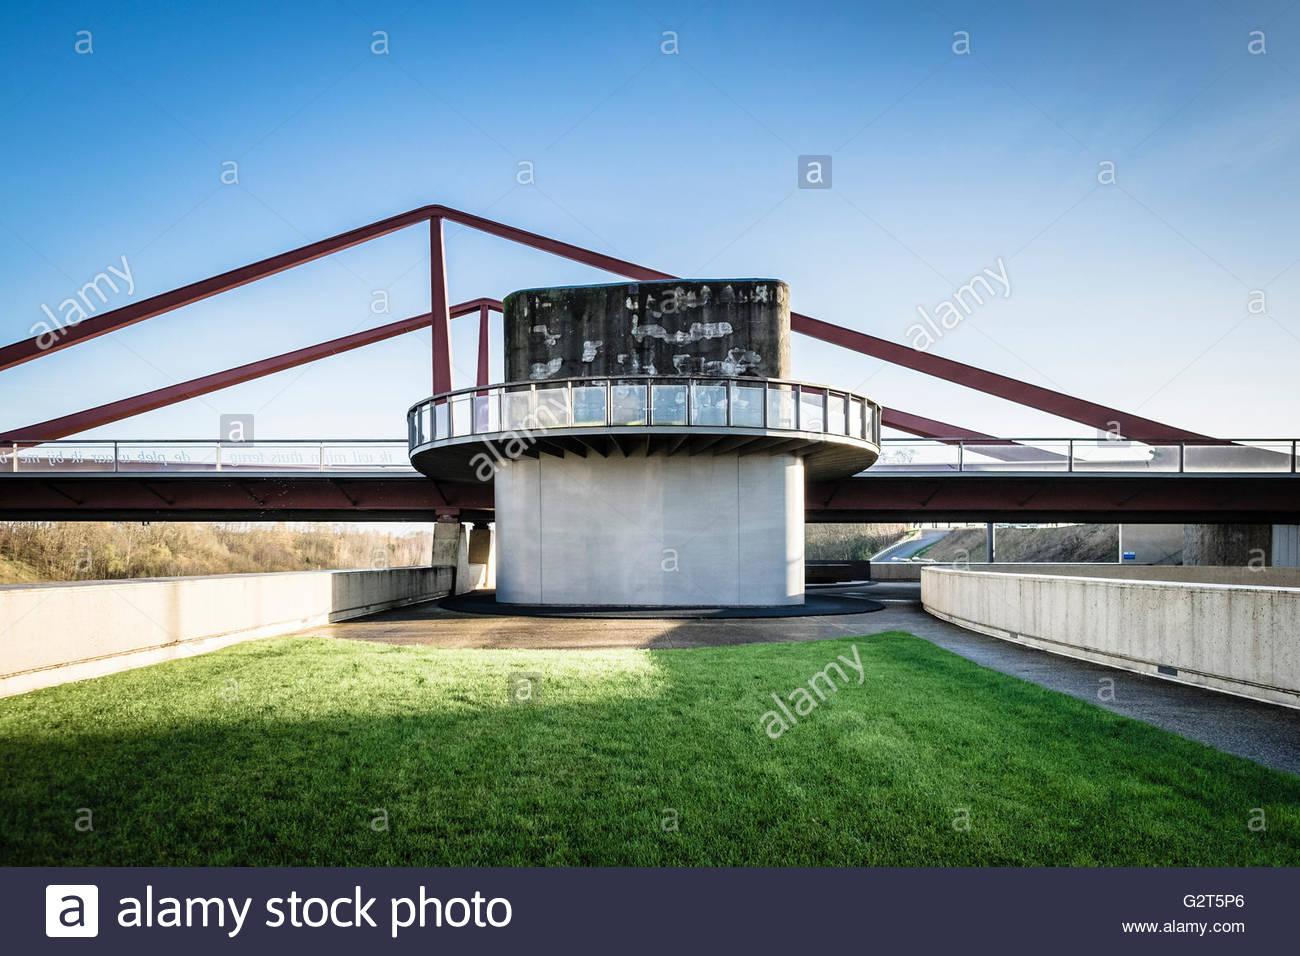 Moderne Architektur, Brug van Vroenhoven, Reimst, Limburg, Flandern (Flandern), Belgien Stockbild